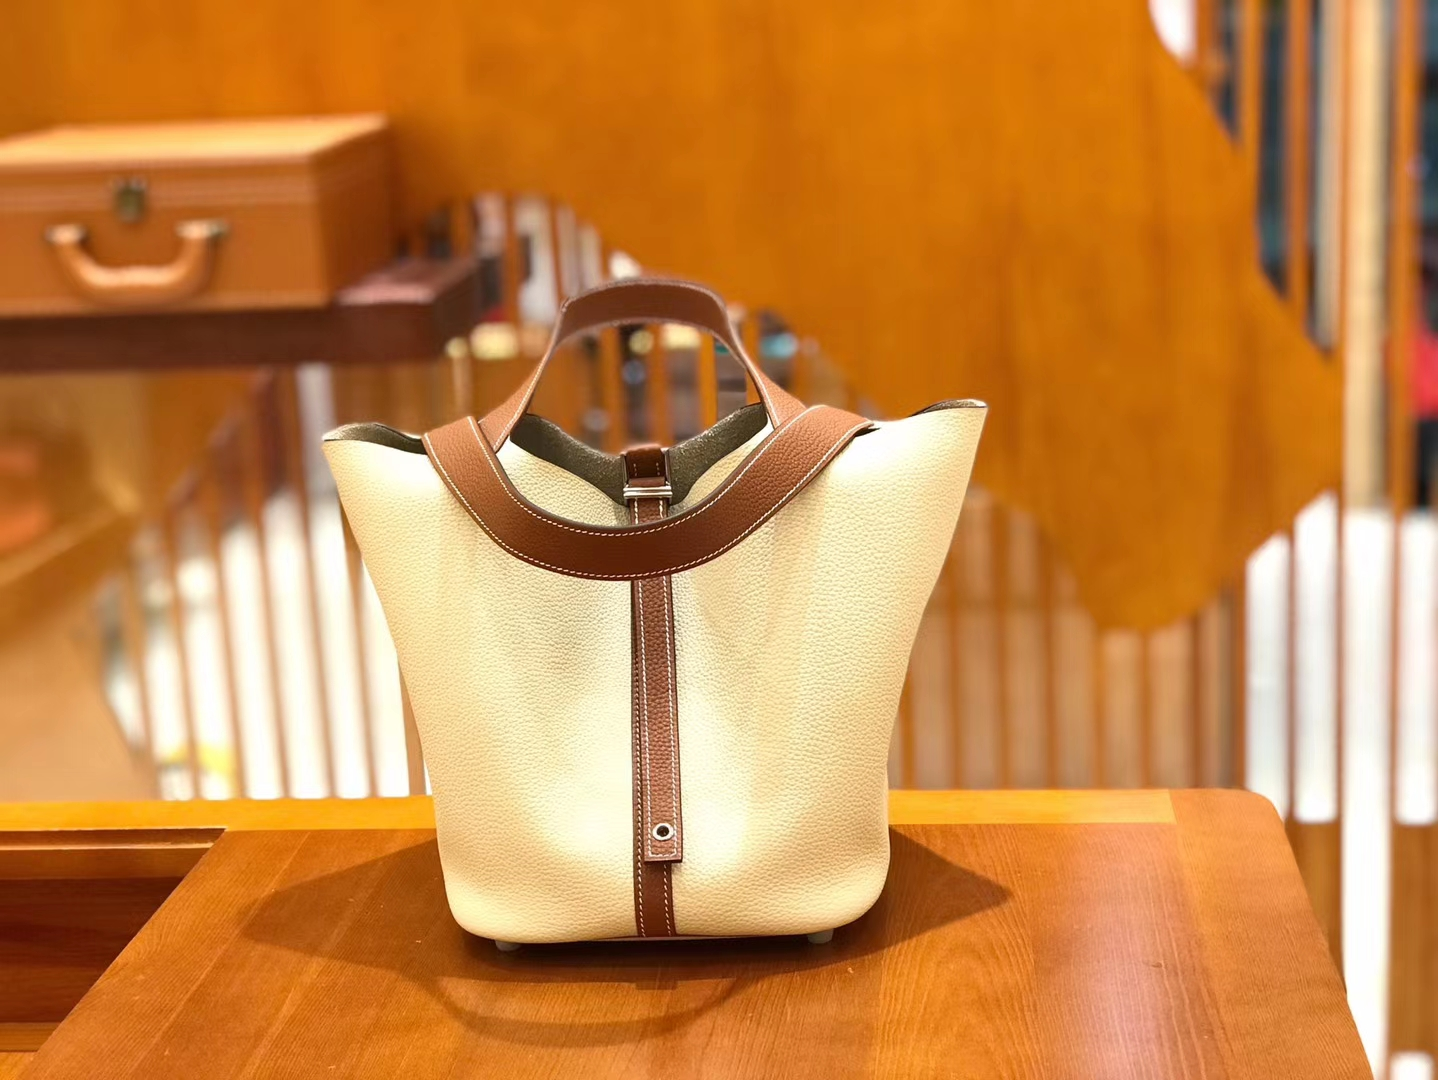 Hermès(爱马仕)Piction 18cm 奶昔白拼金棕色 银扣 Togo小牛皮 全手工缝制